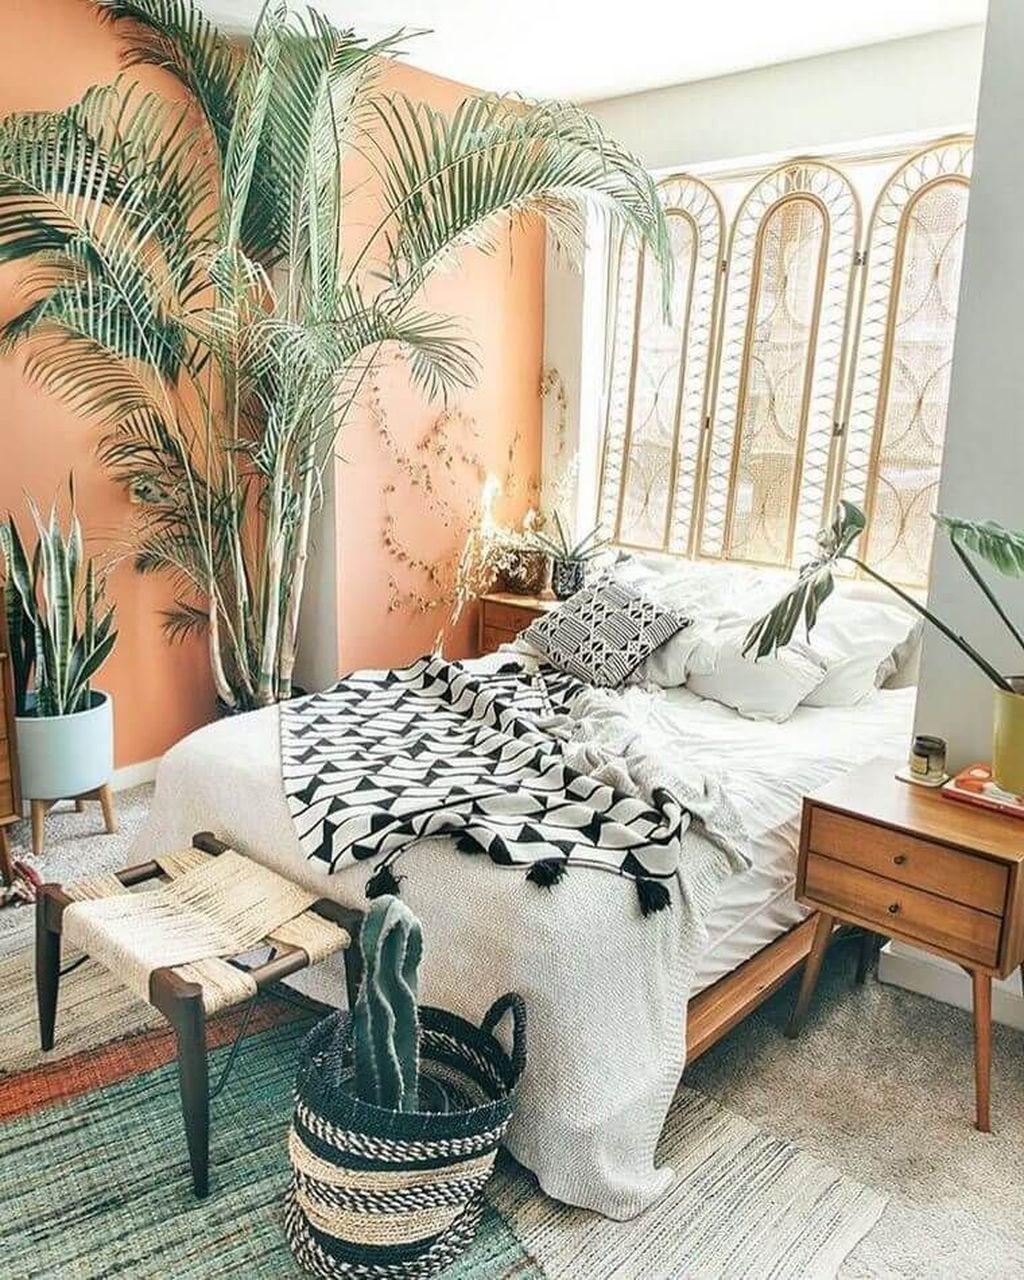 38 Gorgeous Bohemian Bedroom Decor Ideas - HOMEPIEZ